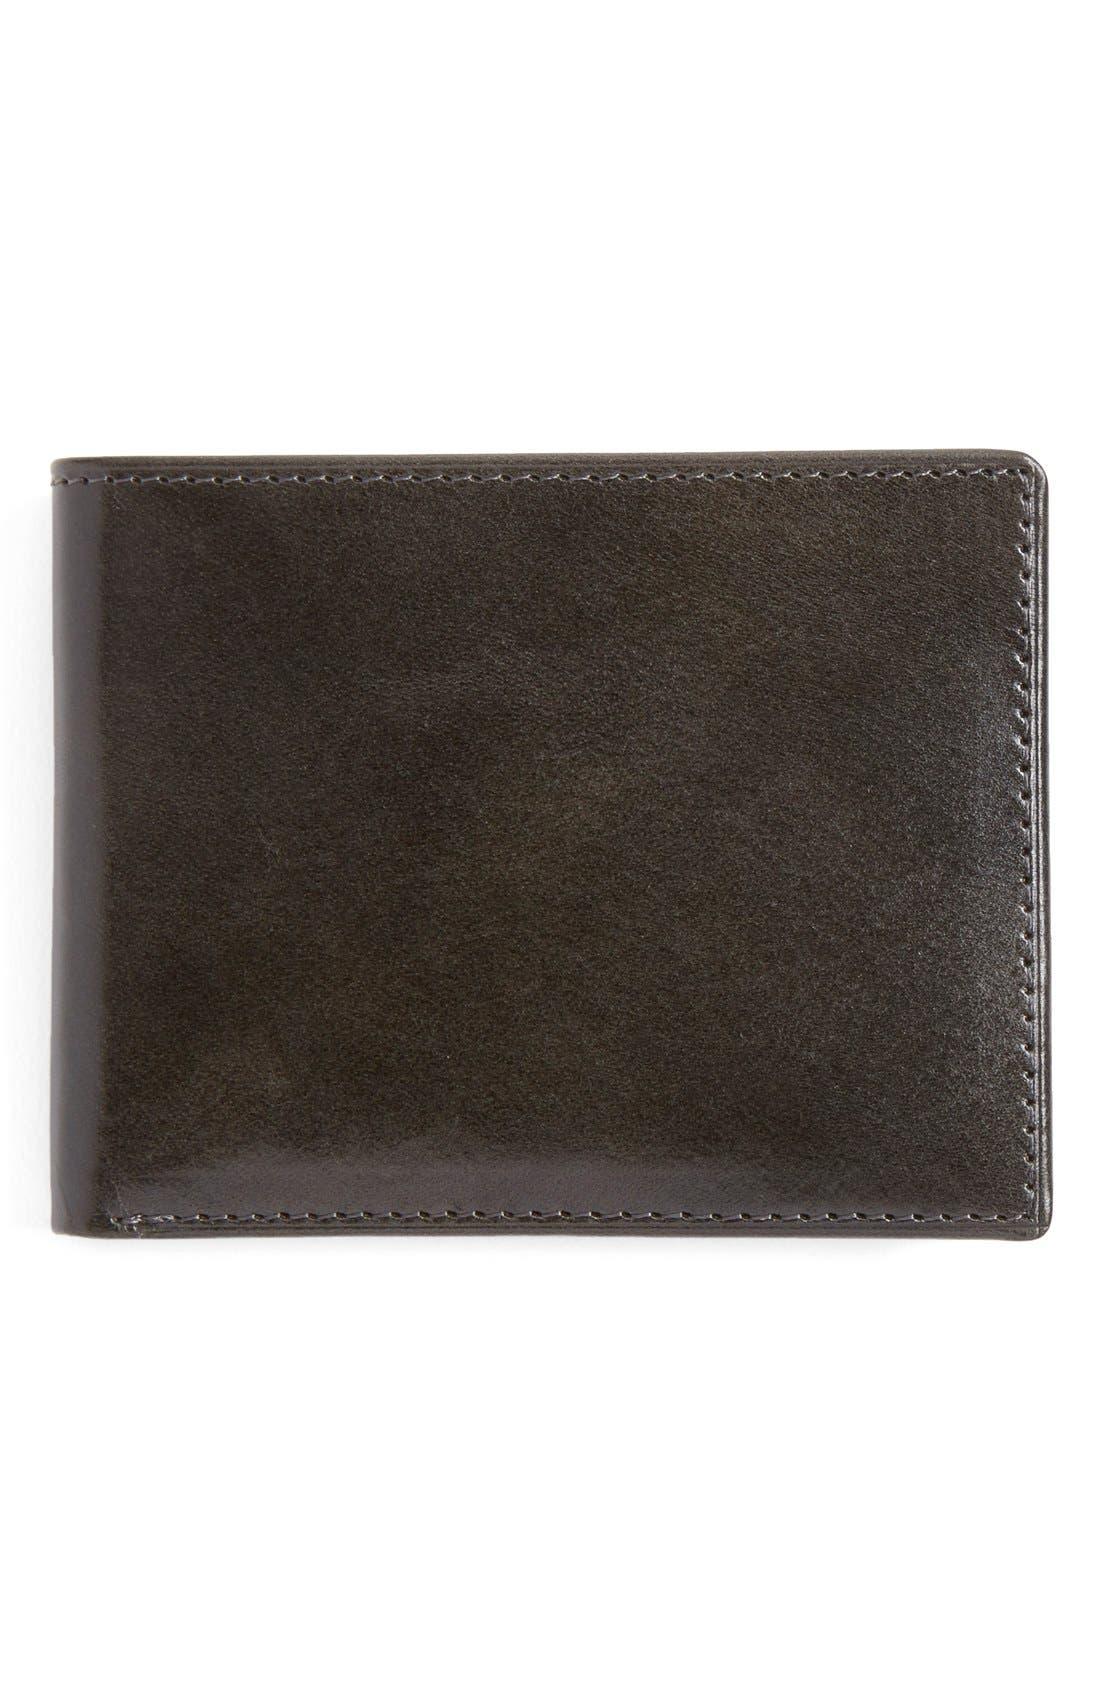 Alternate Image 1 Selected - Johnston & Murphy Slimfold Leather Wallet